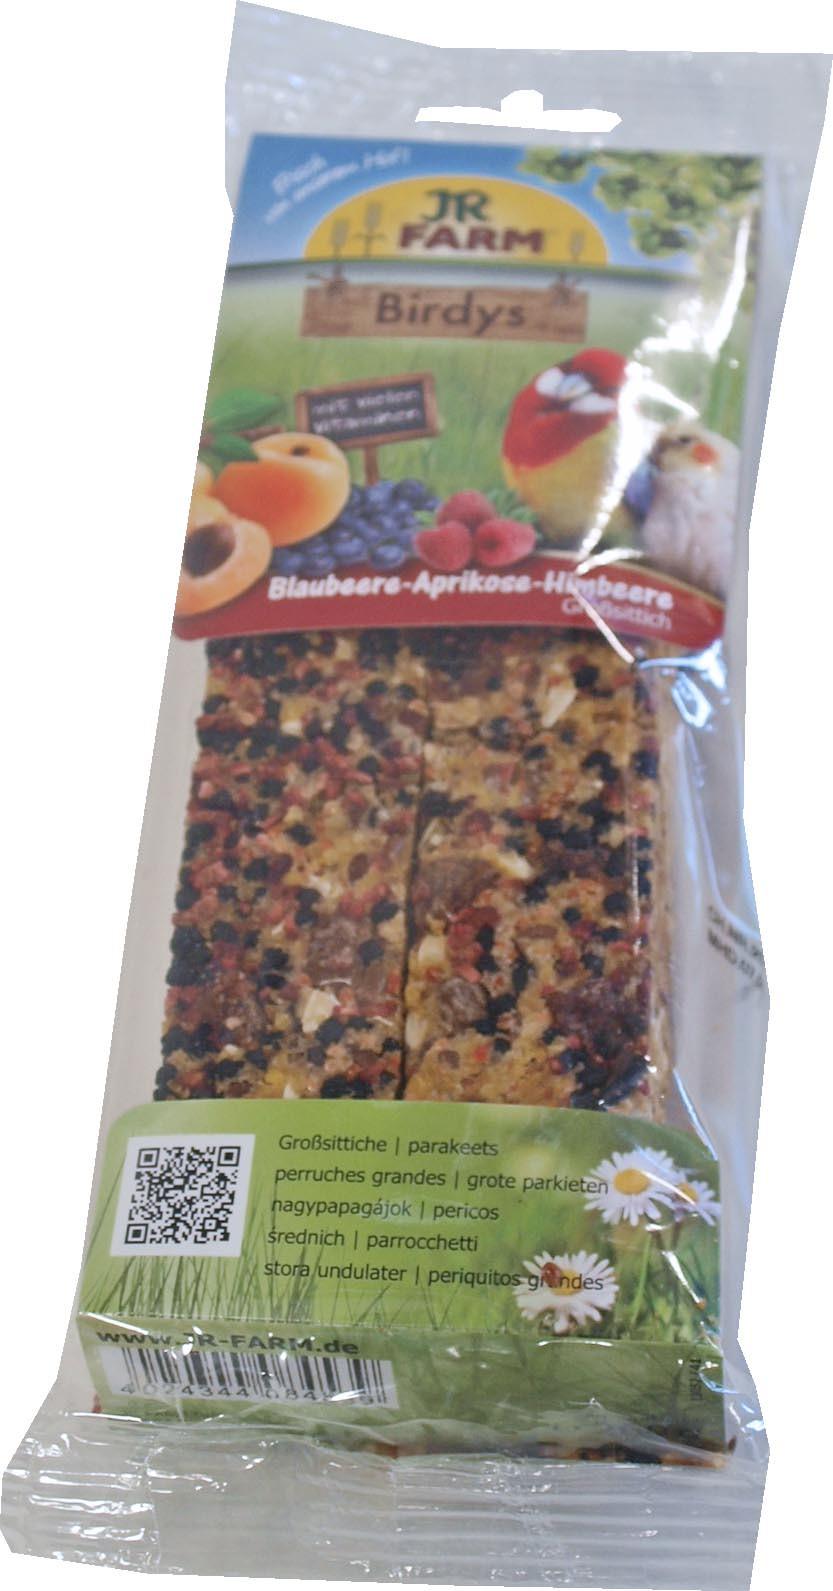 JR Farm Birdy agapornis blauwe bes/ abrikoos/framboos 260 gr